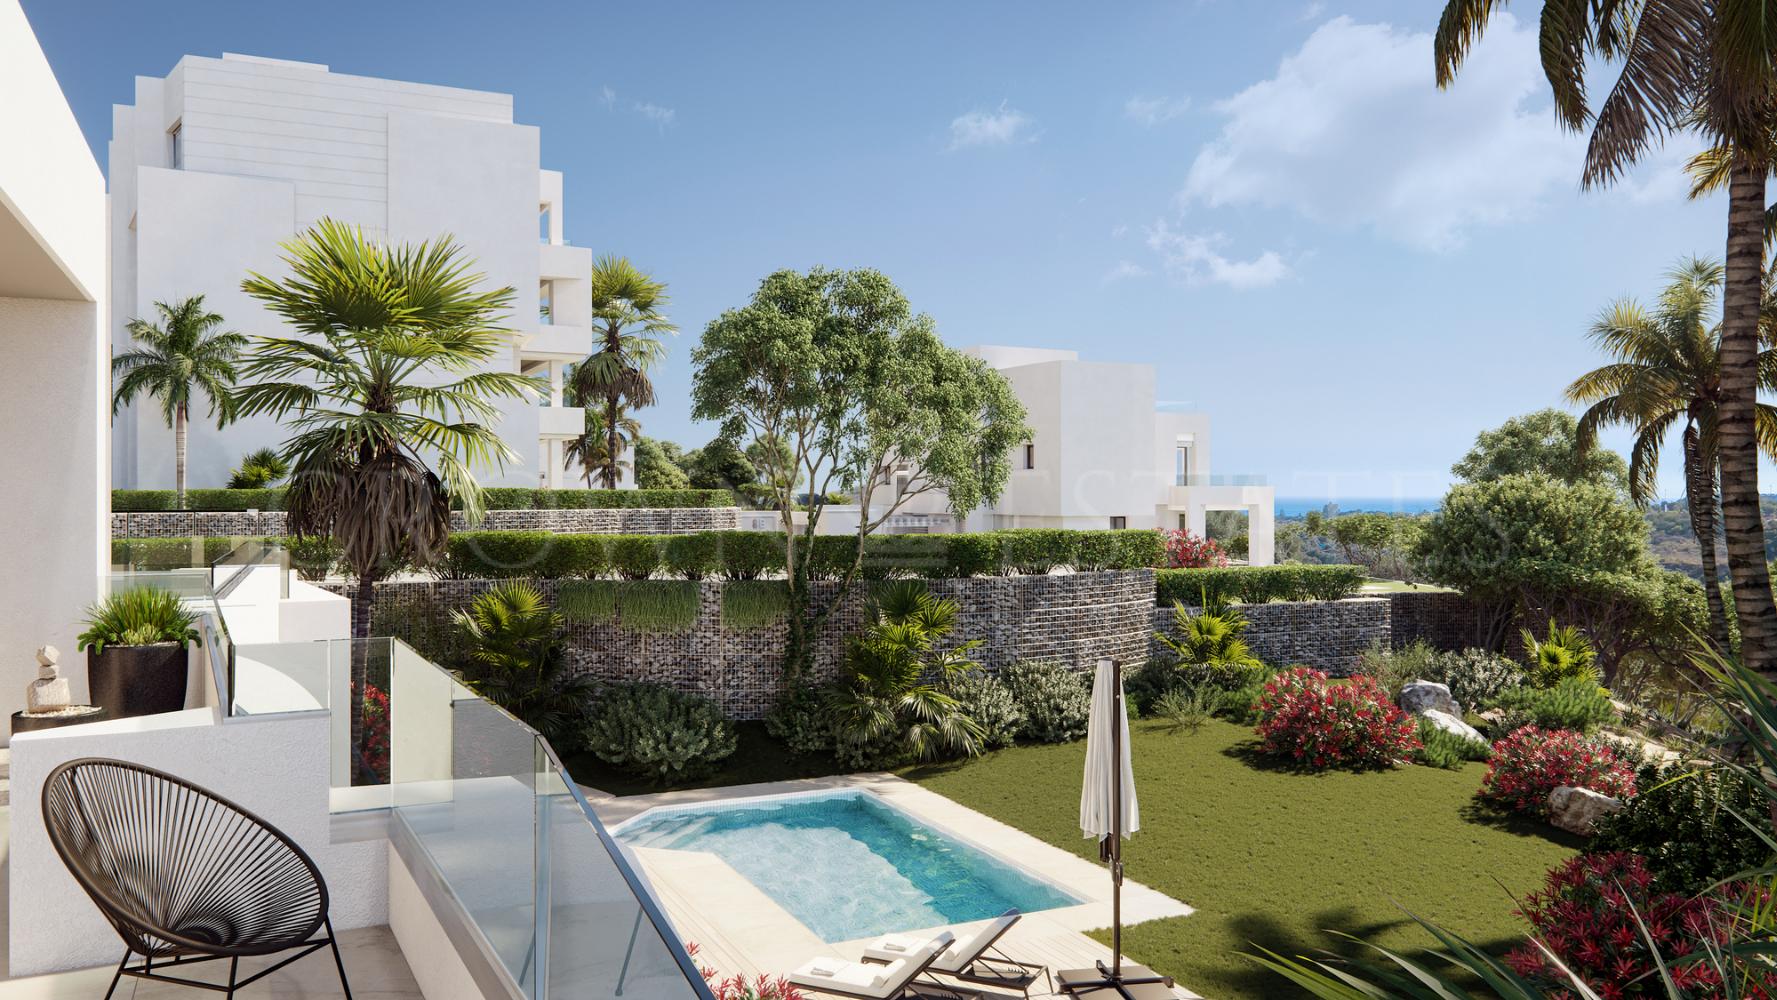 Stunning development for golf lovers in Marbella